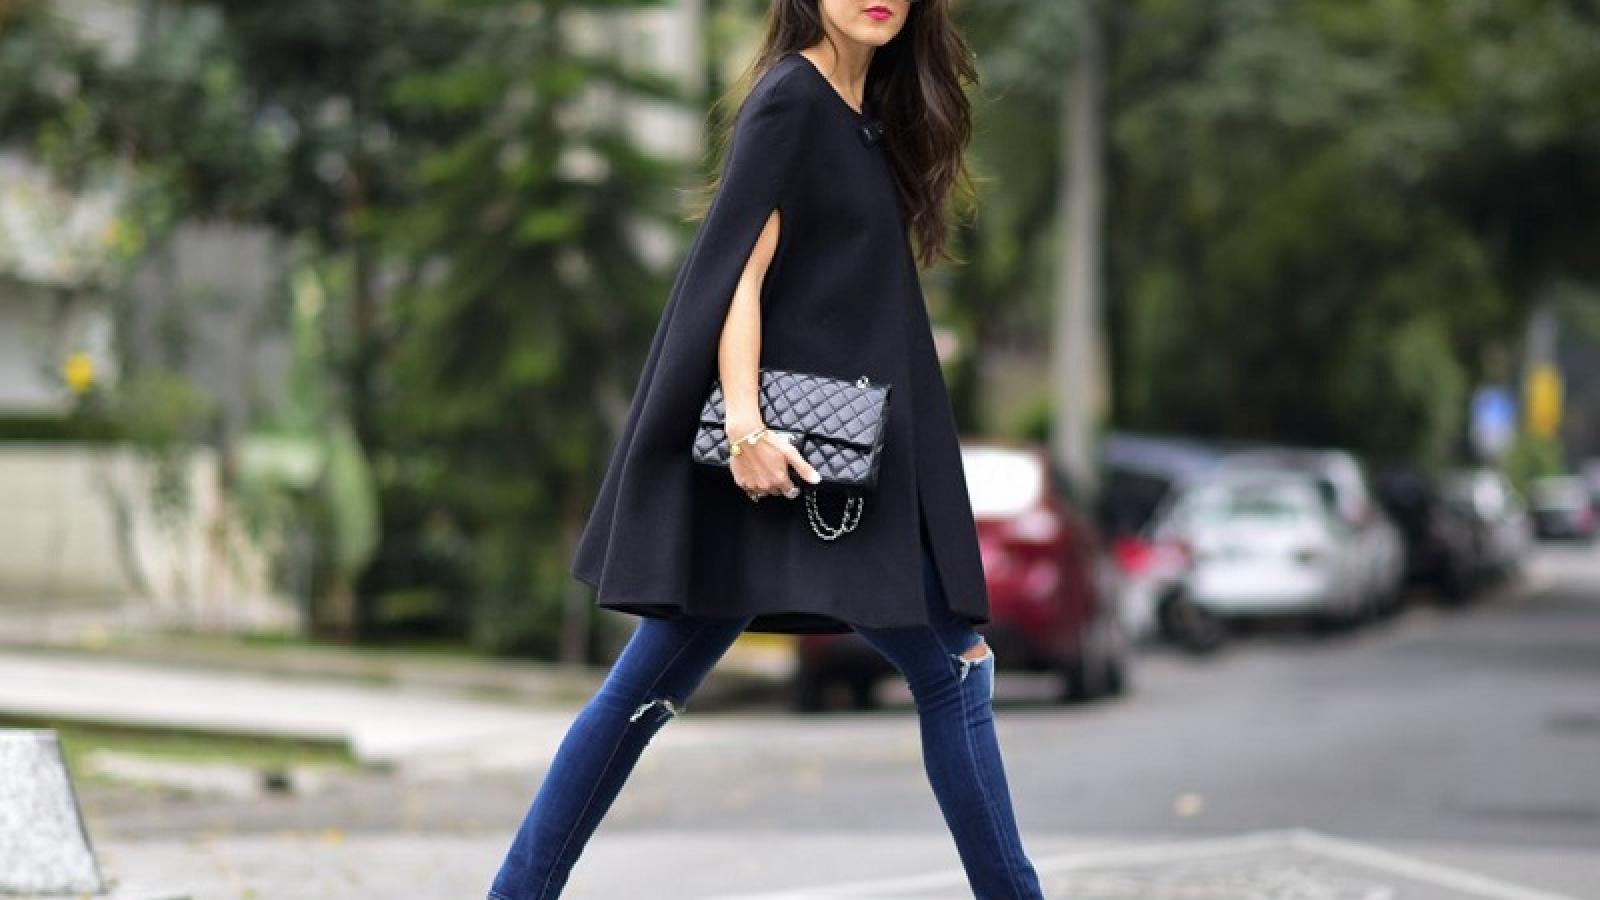 dressing elegantly